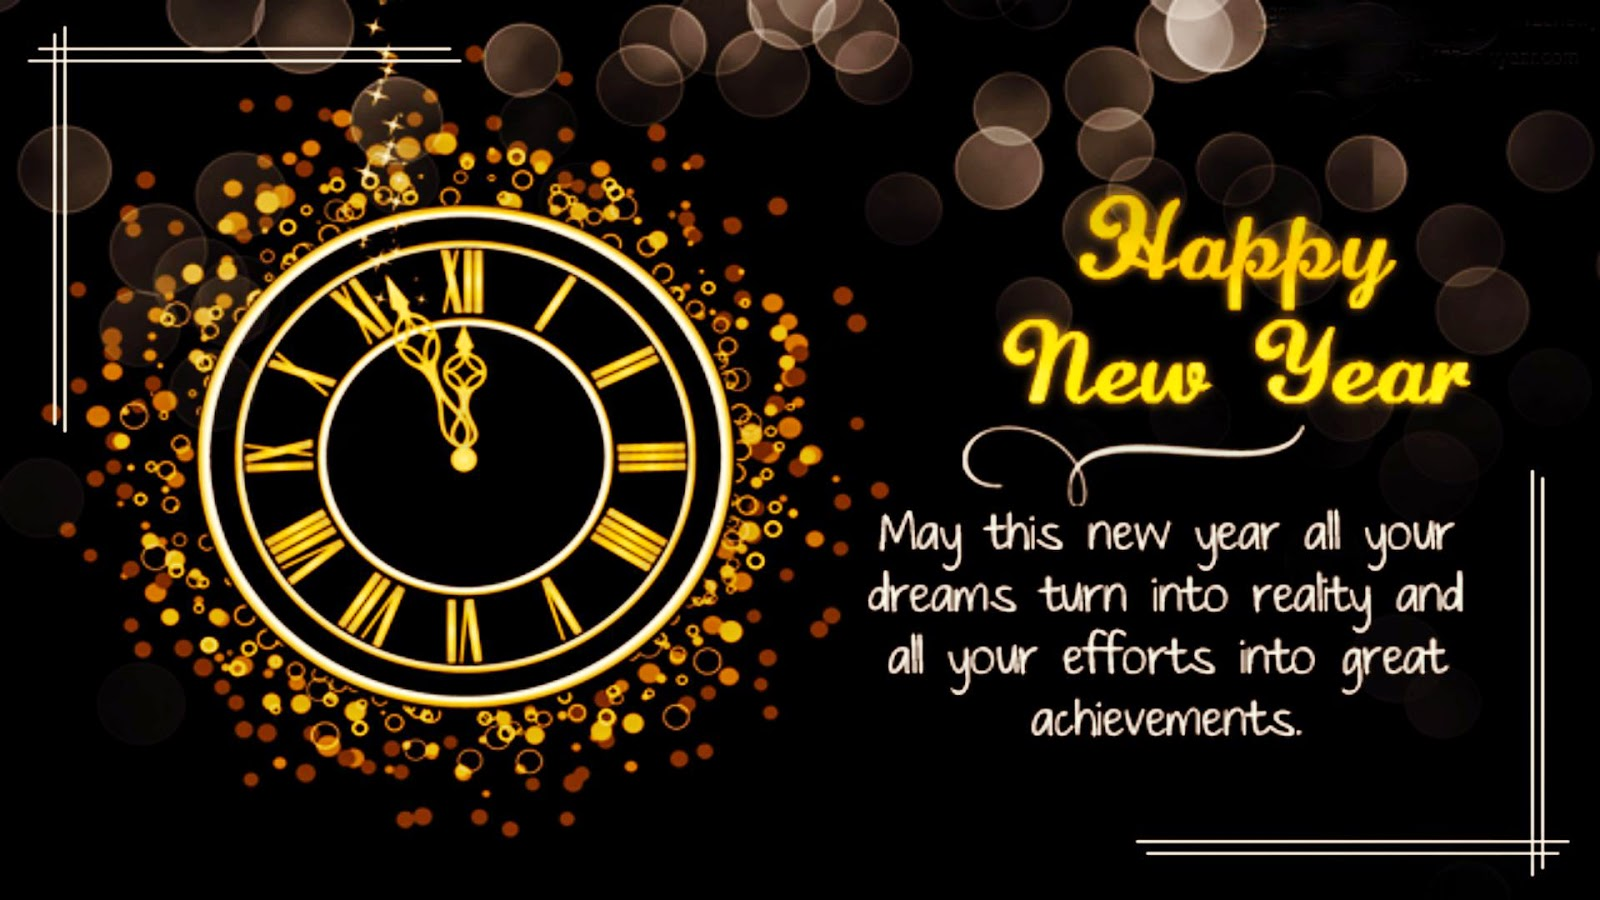 happy new year 2015 quotes 1600x900